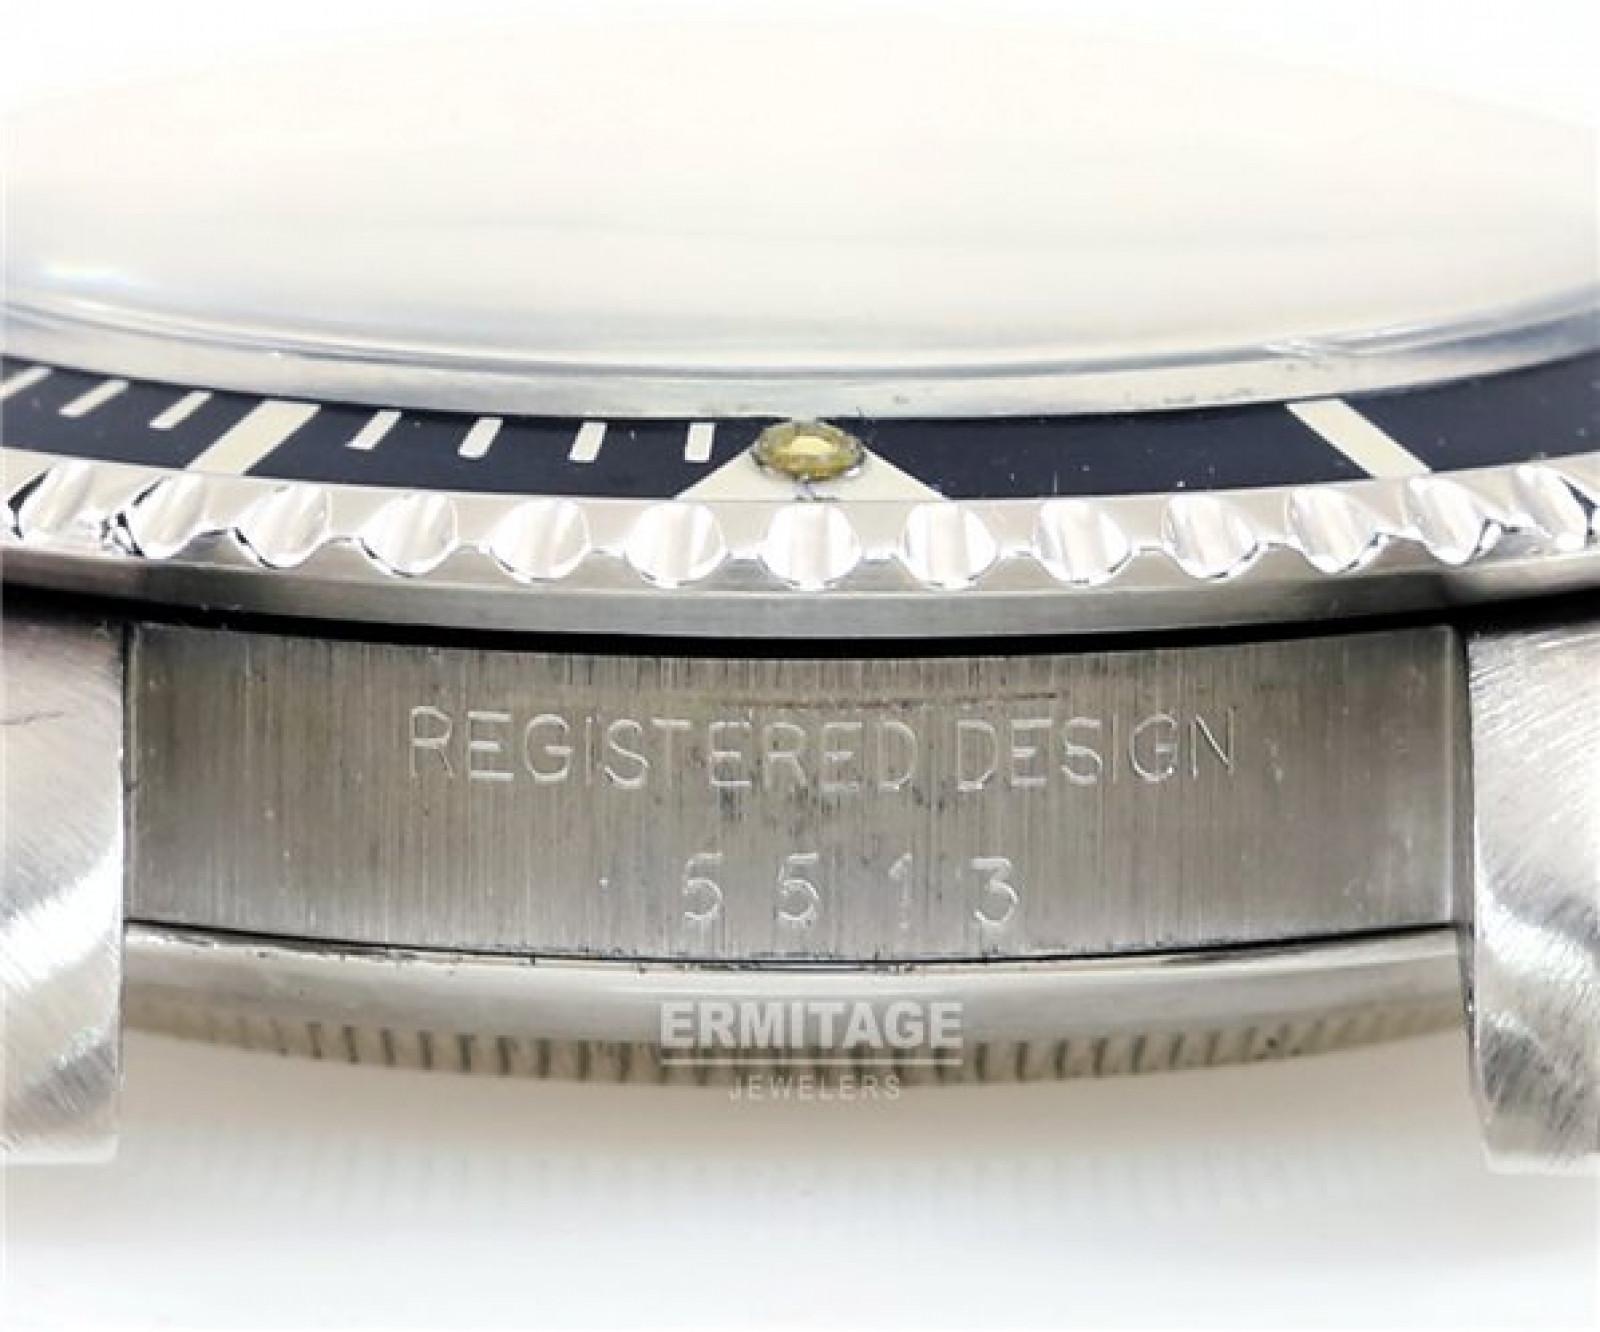 Vintage Rolex Submariner 5513 Steel with Black Dial 1979